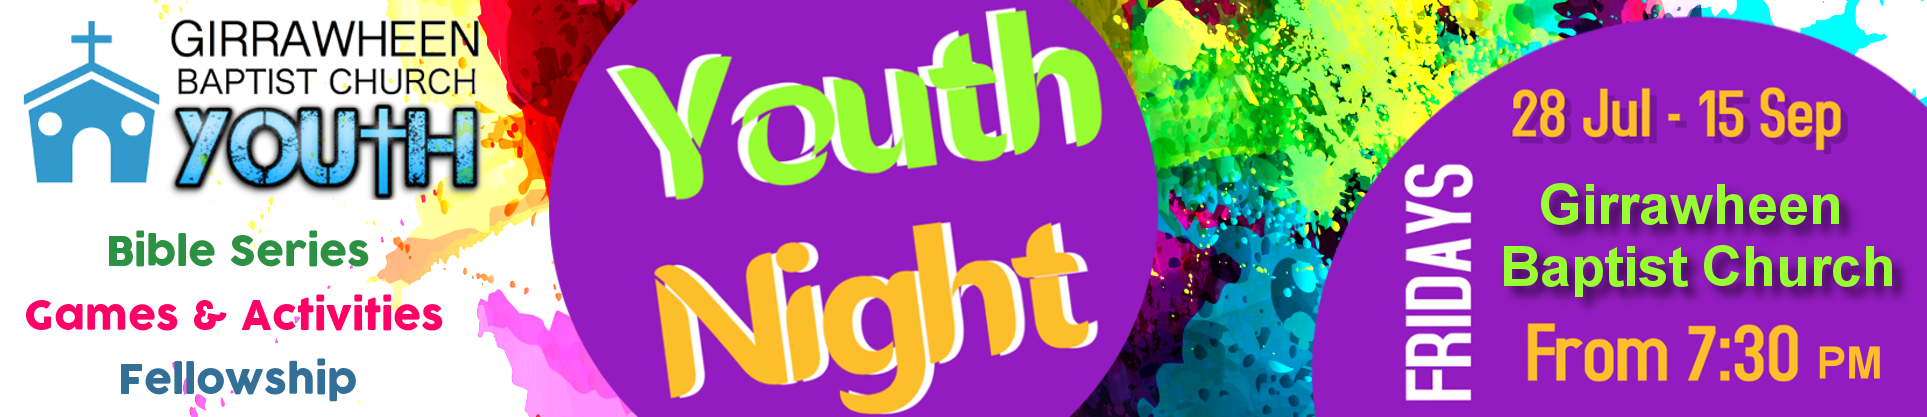 Youth Night 2017